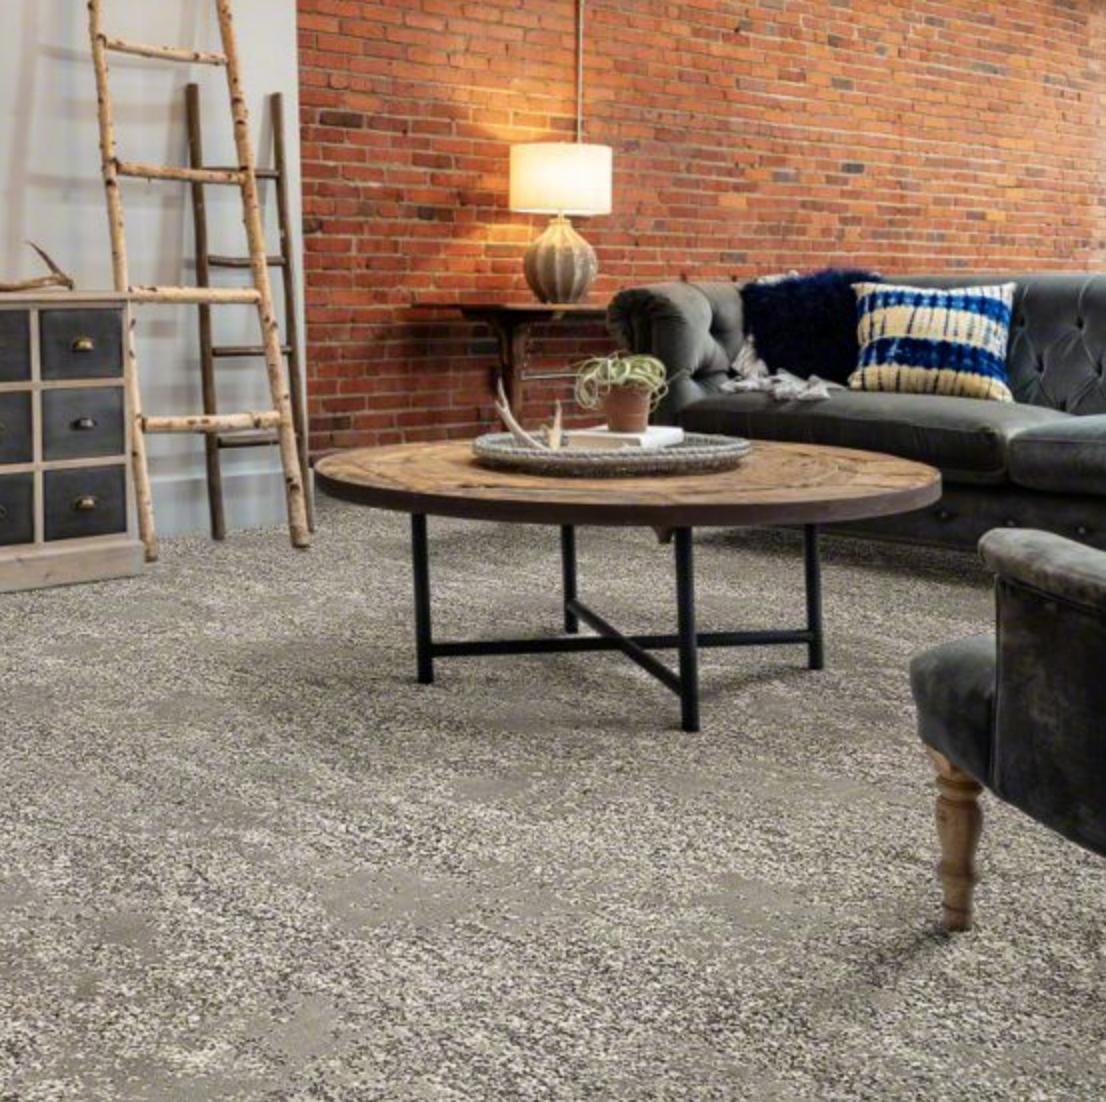 Tavares (ZZ10-10) Carpet Flooring  Anderson Tuftex  White